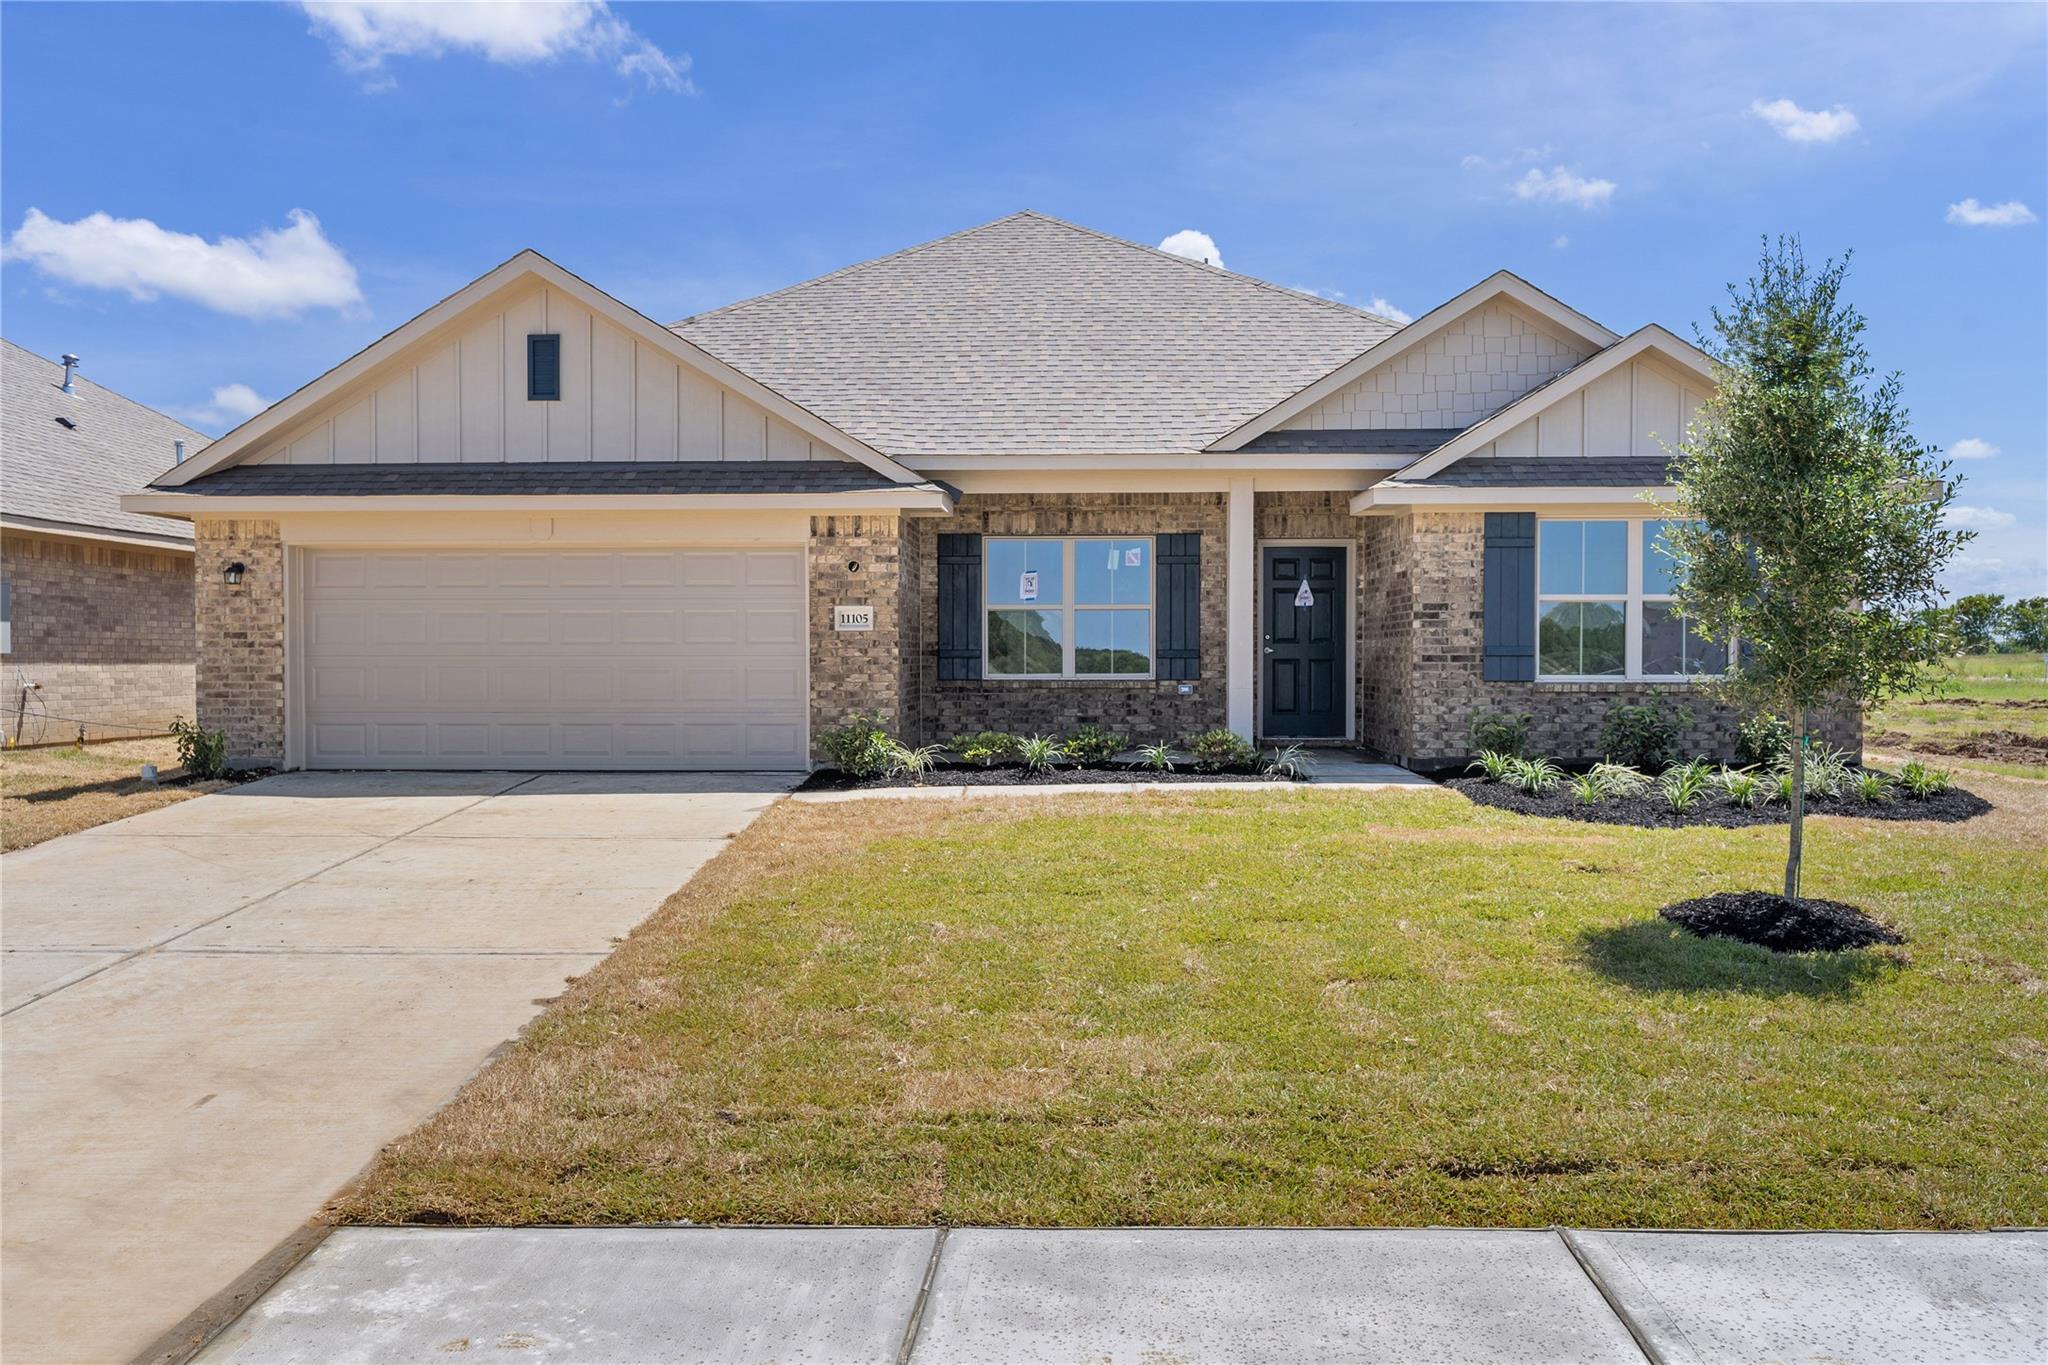 11105 Rison Property Photo - Texas City, TX real estate listing